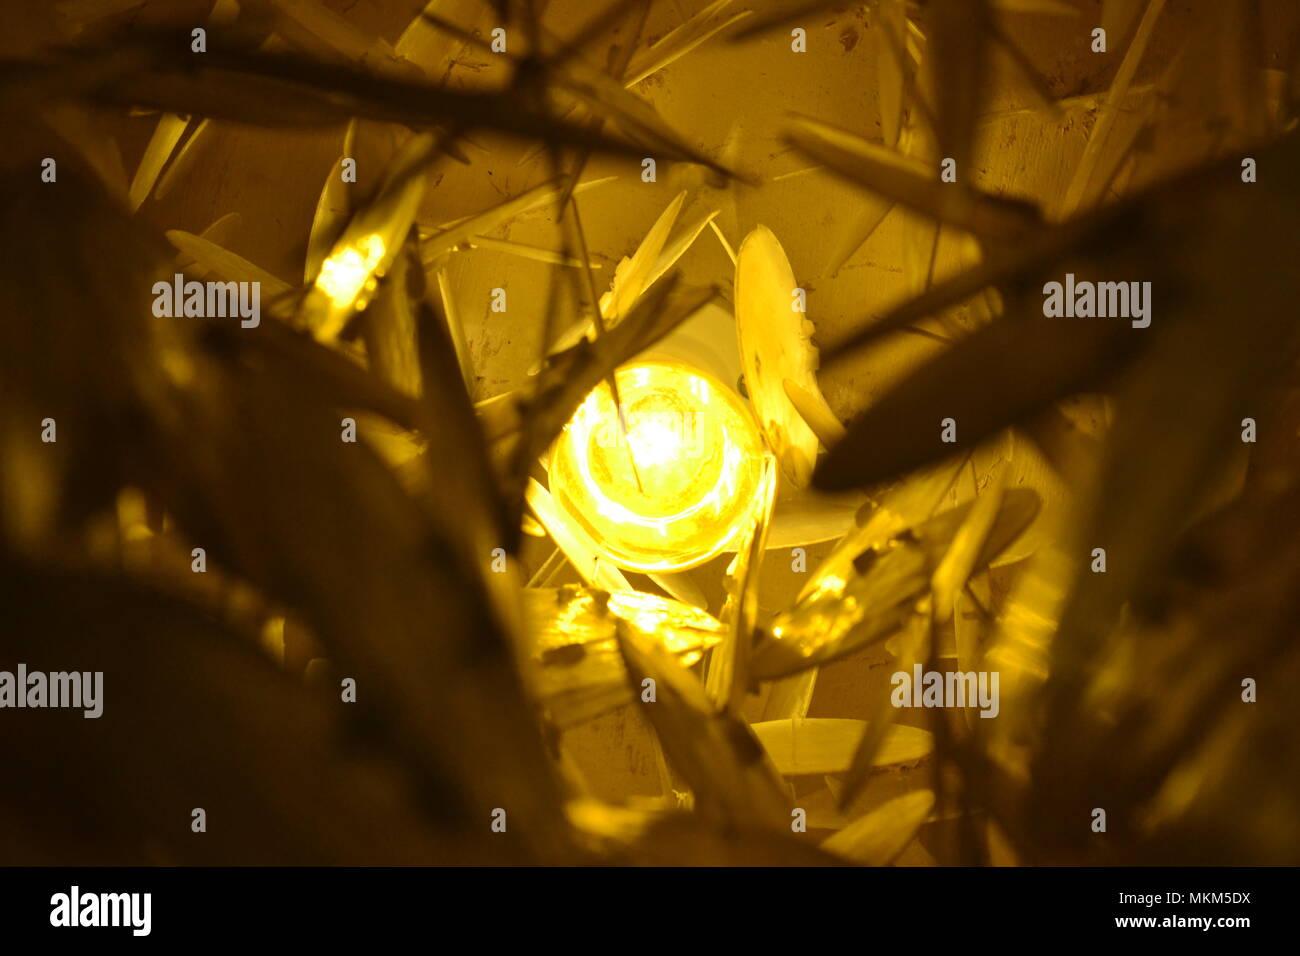 Luce interna a un lampadario a bracci. Immagini Stock